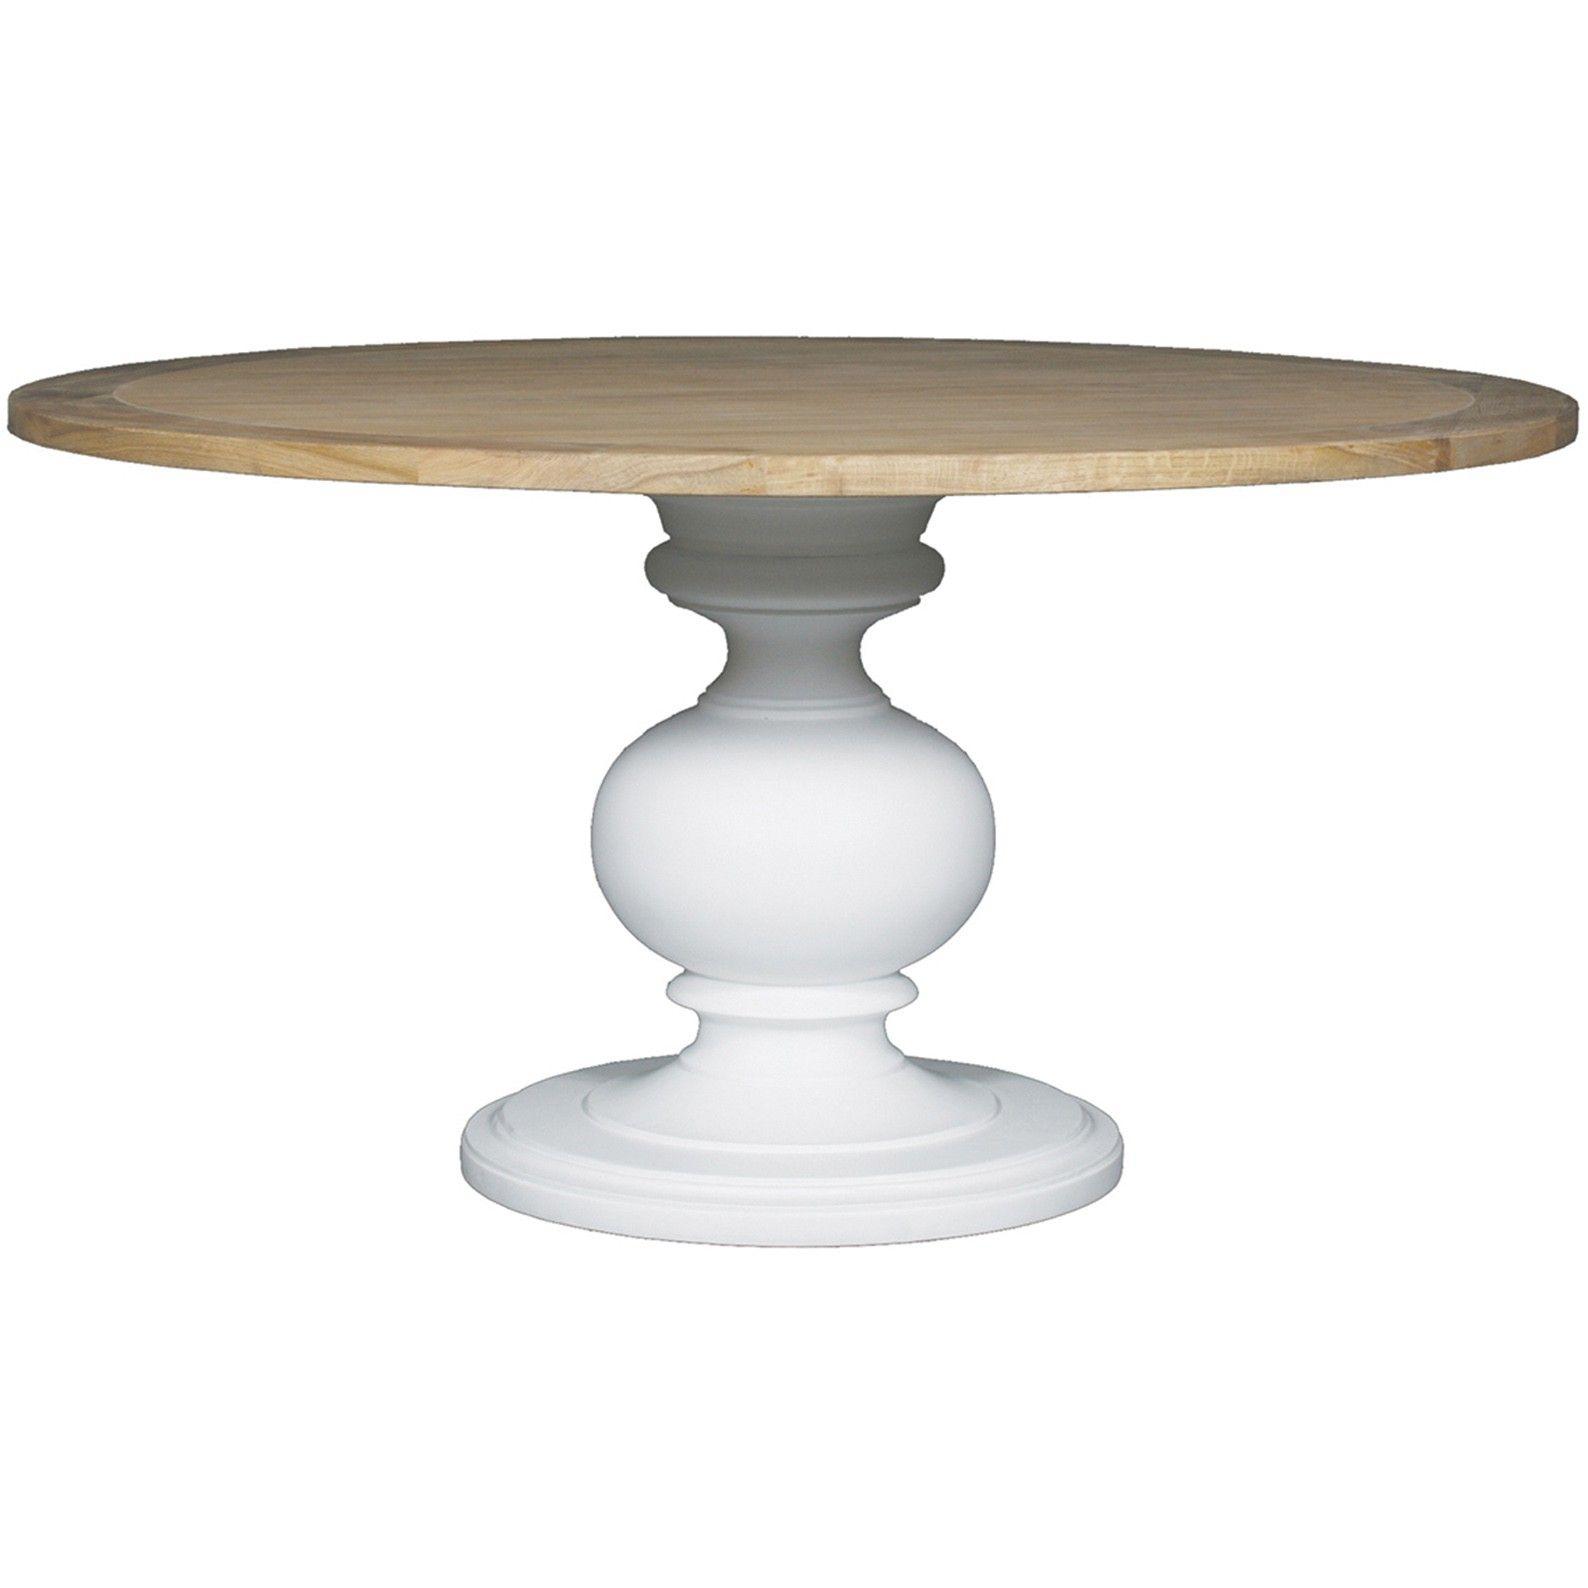 Rodin Round Dining Table WhiteAW HomePinterestRound